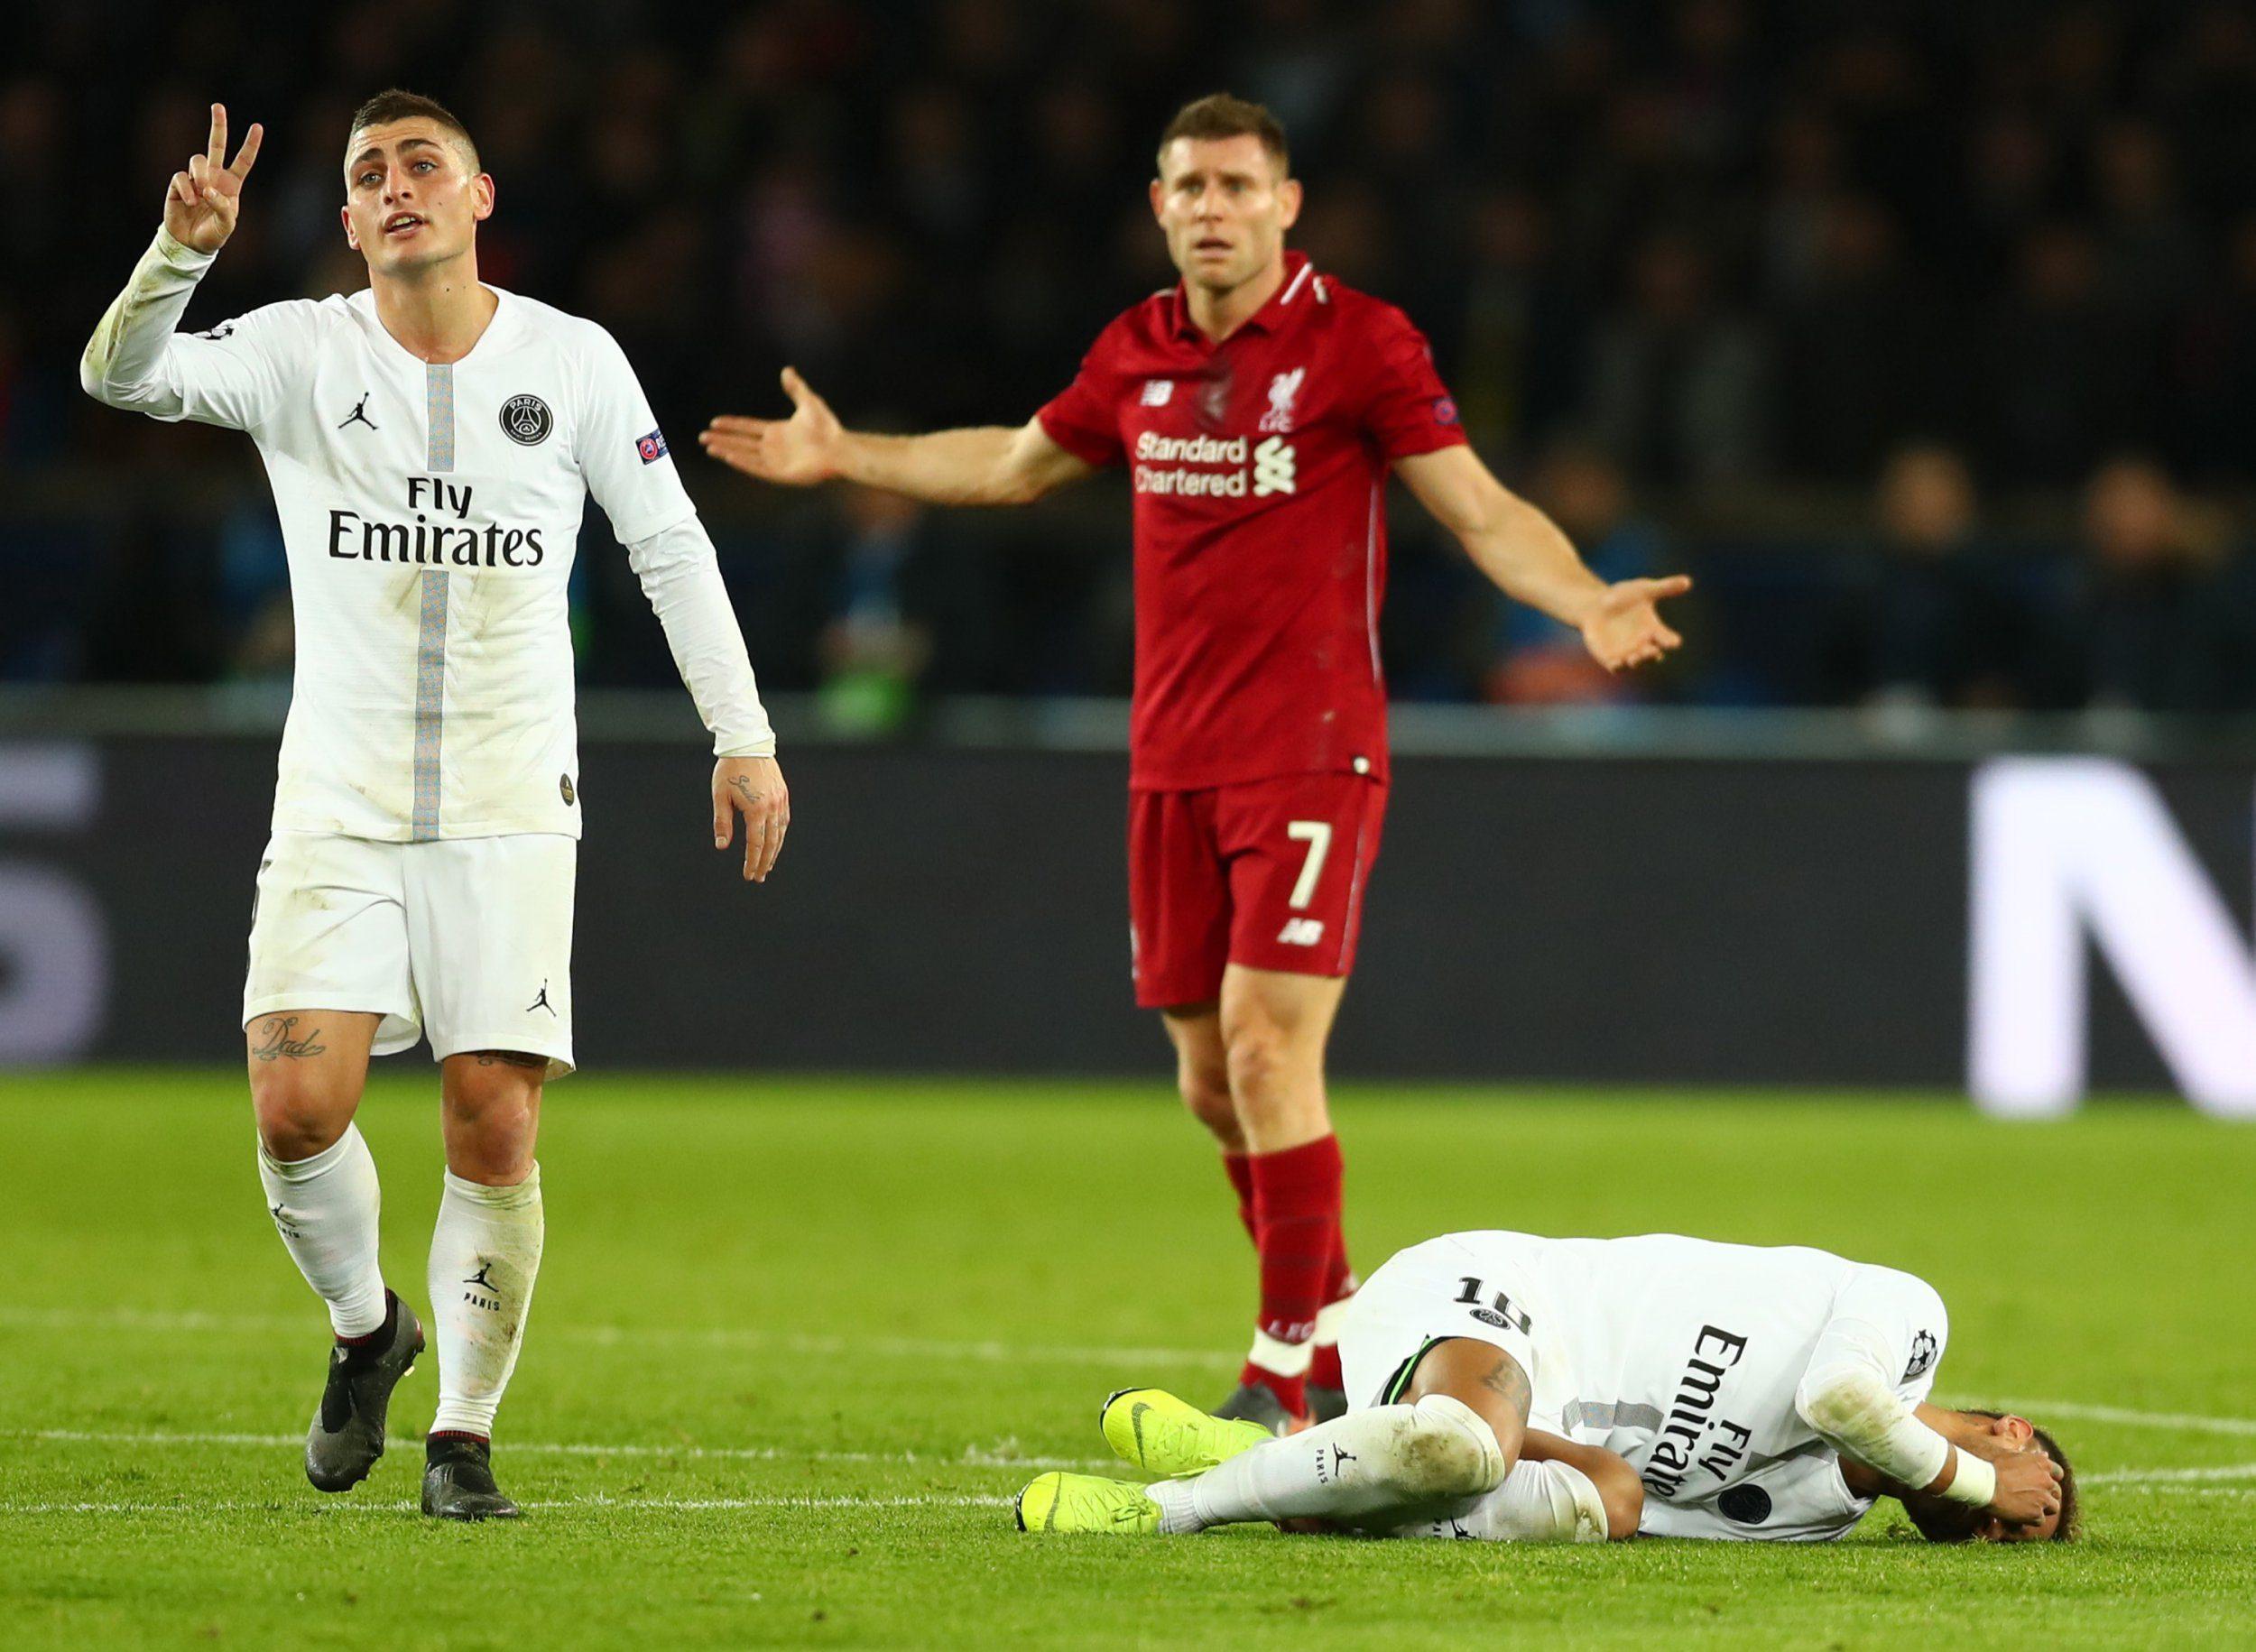 James Milner slams Neymar and Paris Saint-Germain's tactics after Liverpool loss